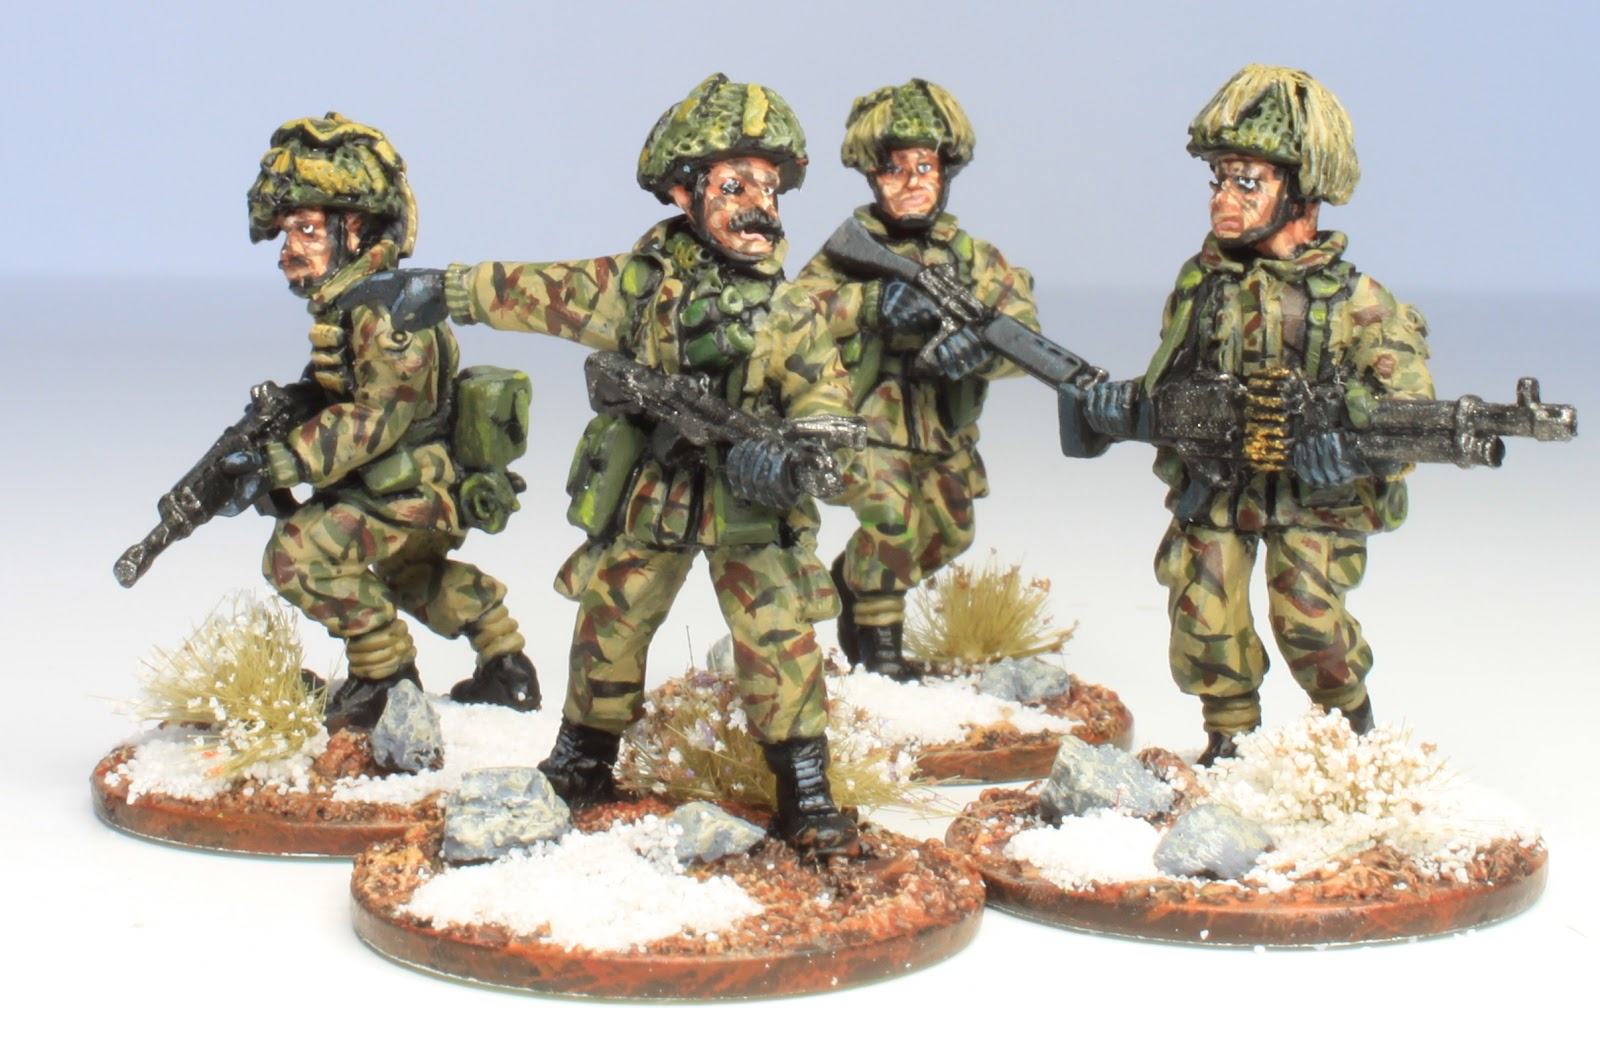 28mm Victorian Warfare: 28mm Falklands War British